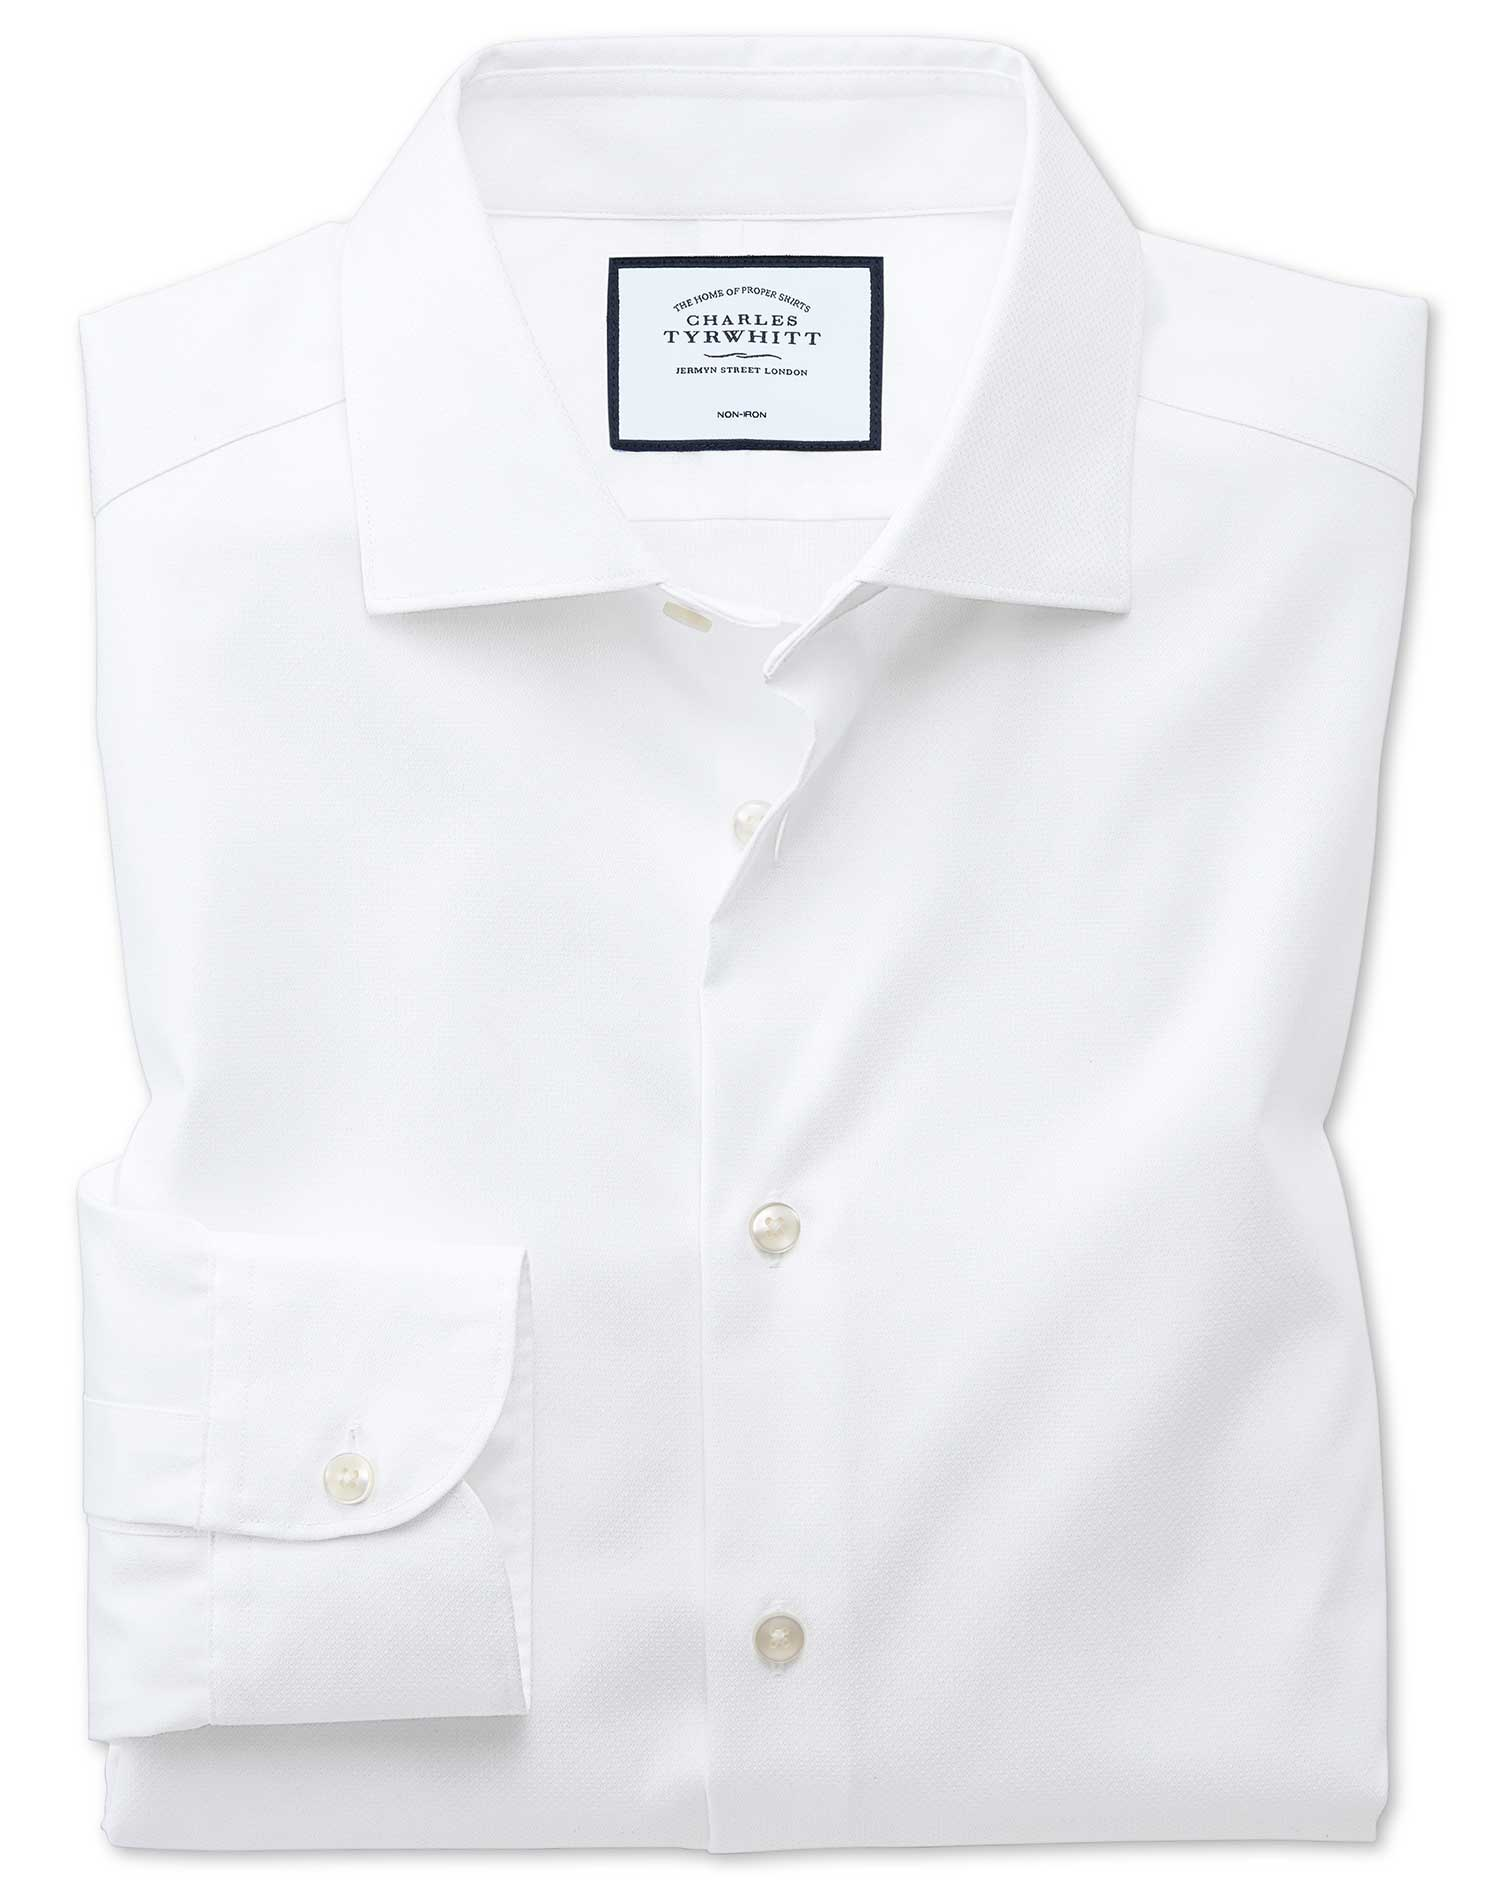 Slim Fit Semi-Cutaway Business Casual Non-Iron Modern Textures White Cotton Formal Shirt Single Cuff